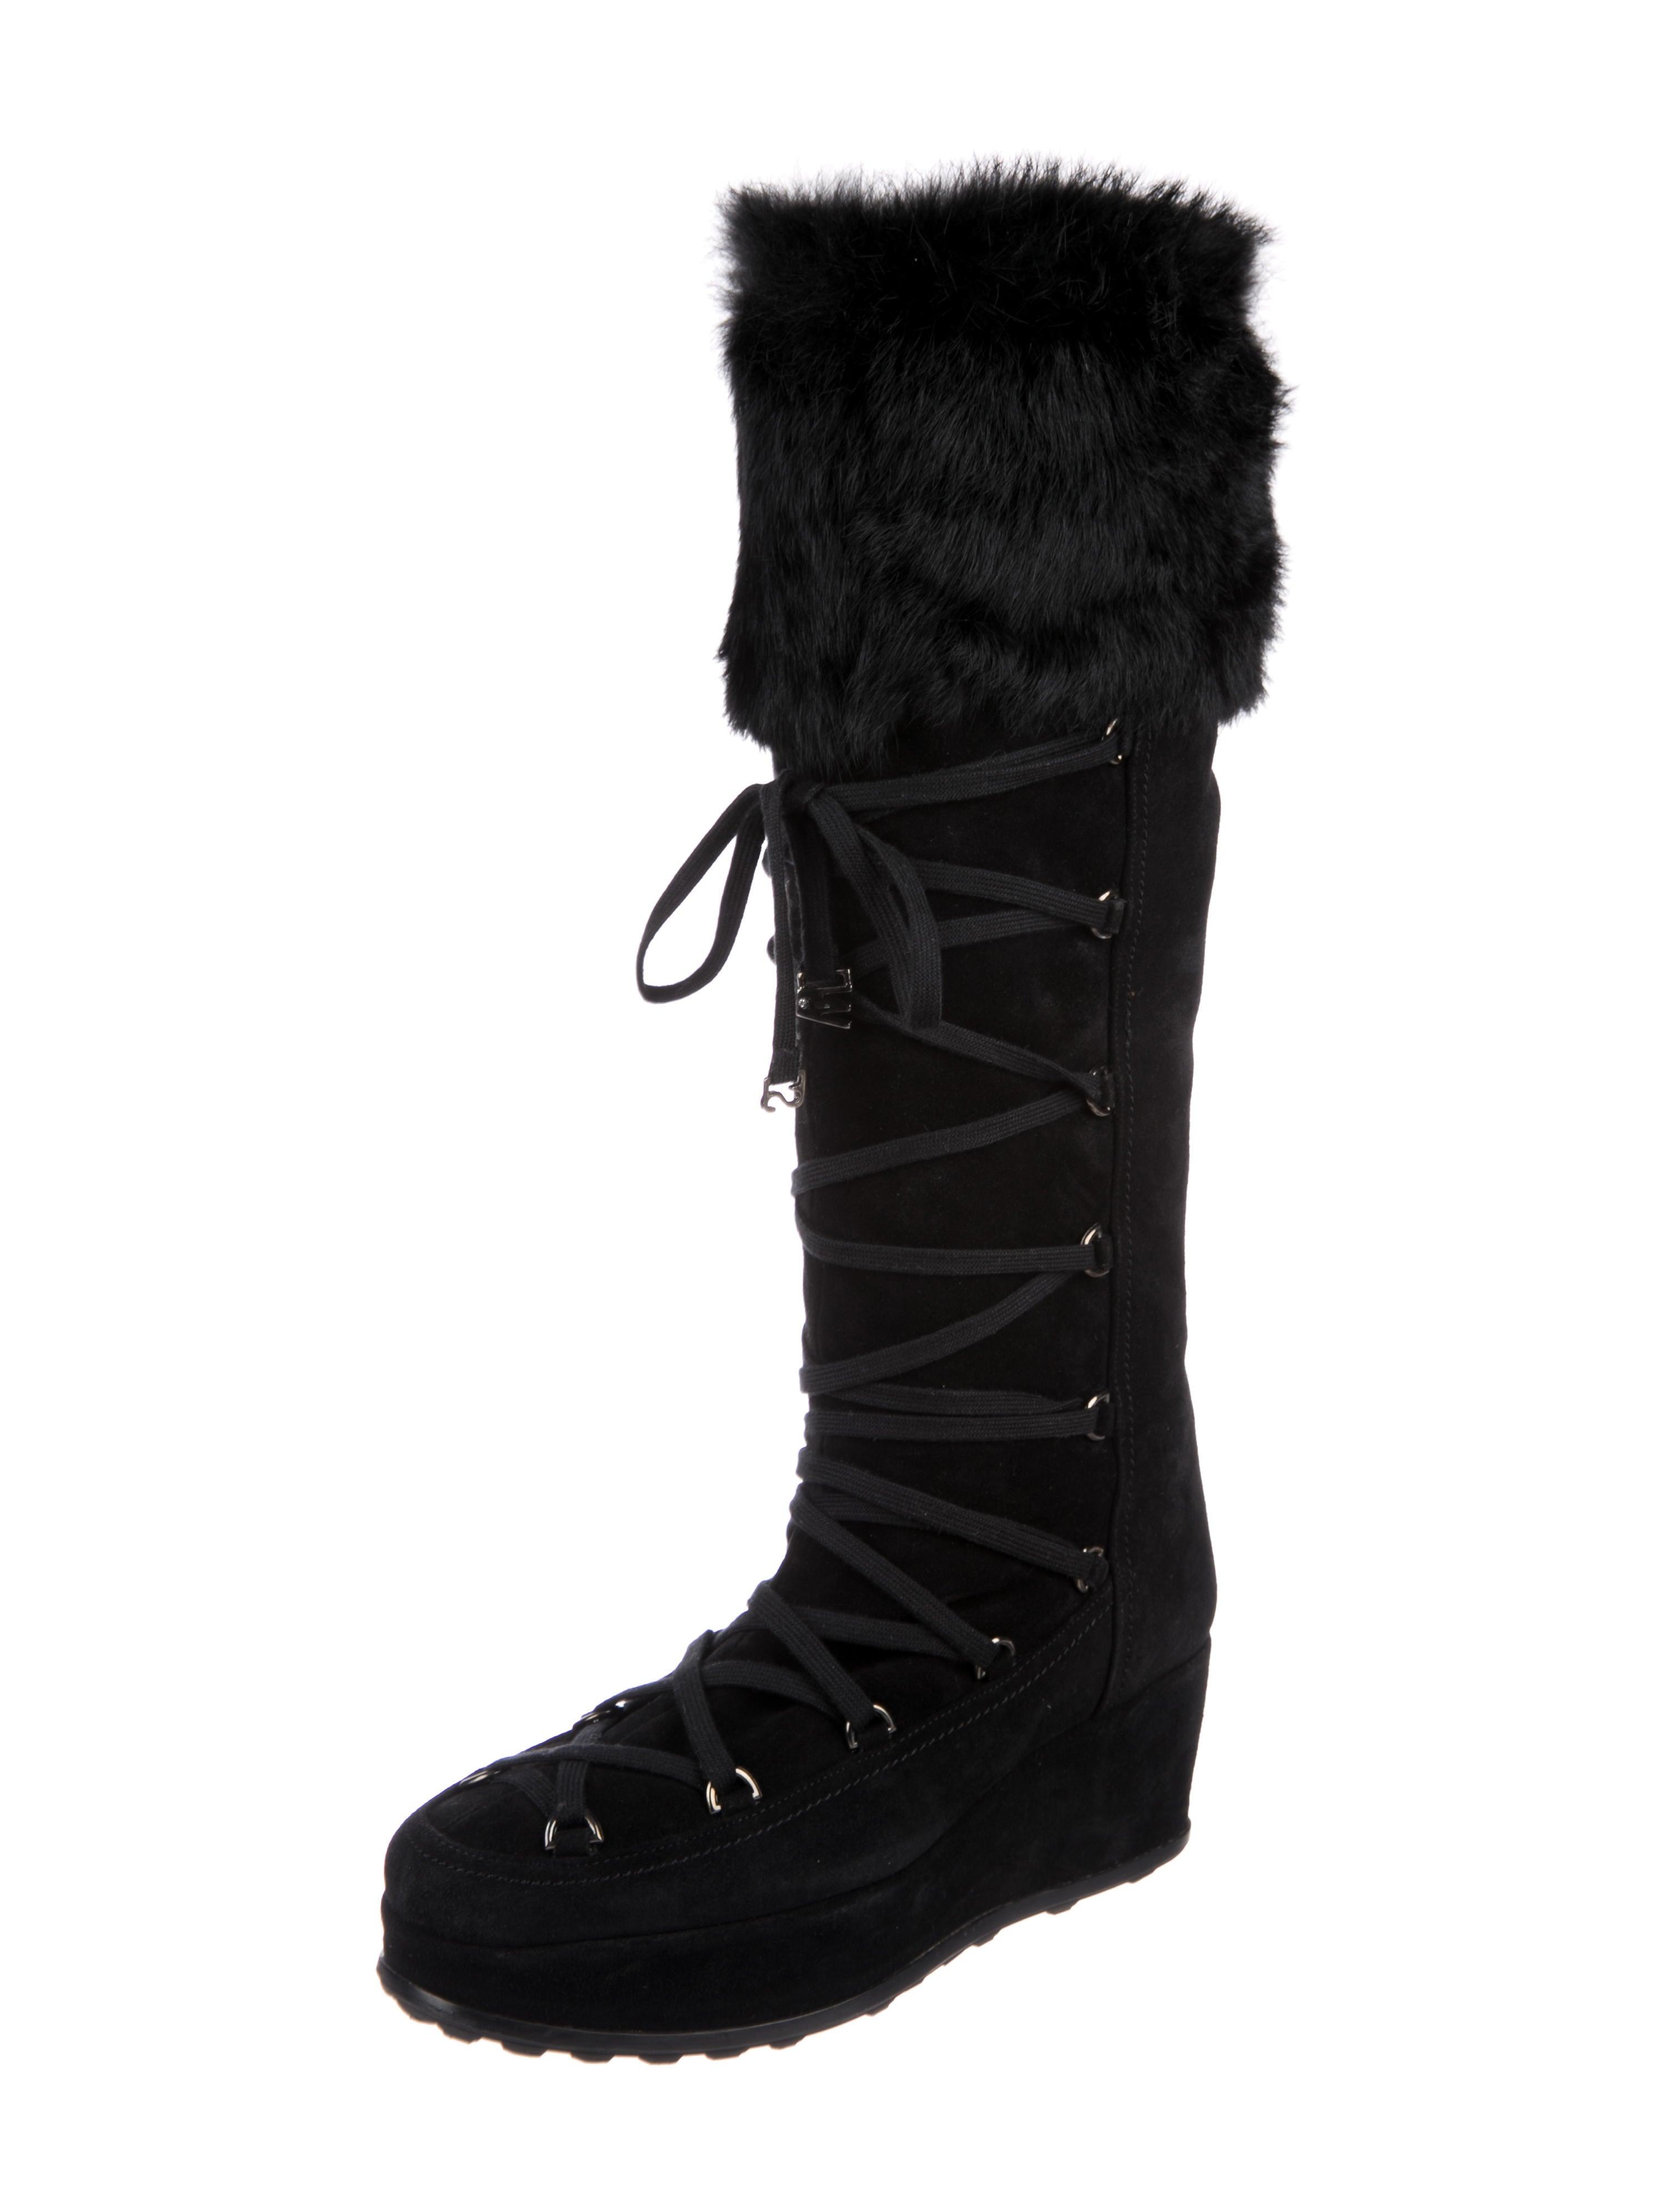 Stuart Weitzman Troll Knee-High Boots discount cost f7GW0obiM